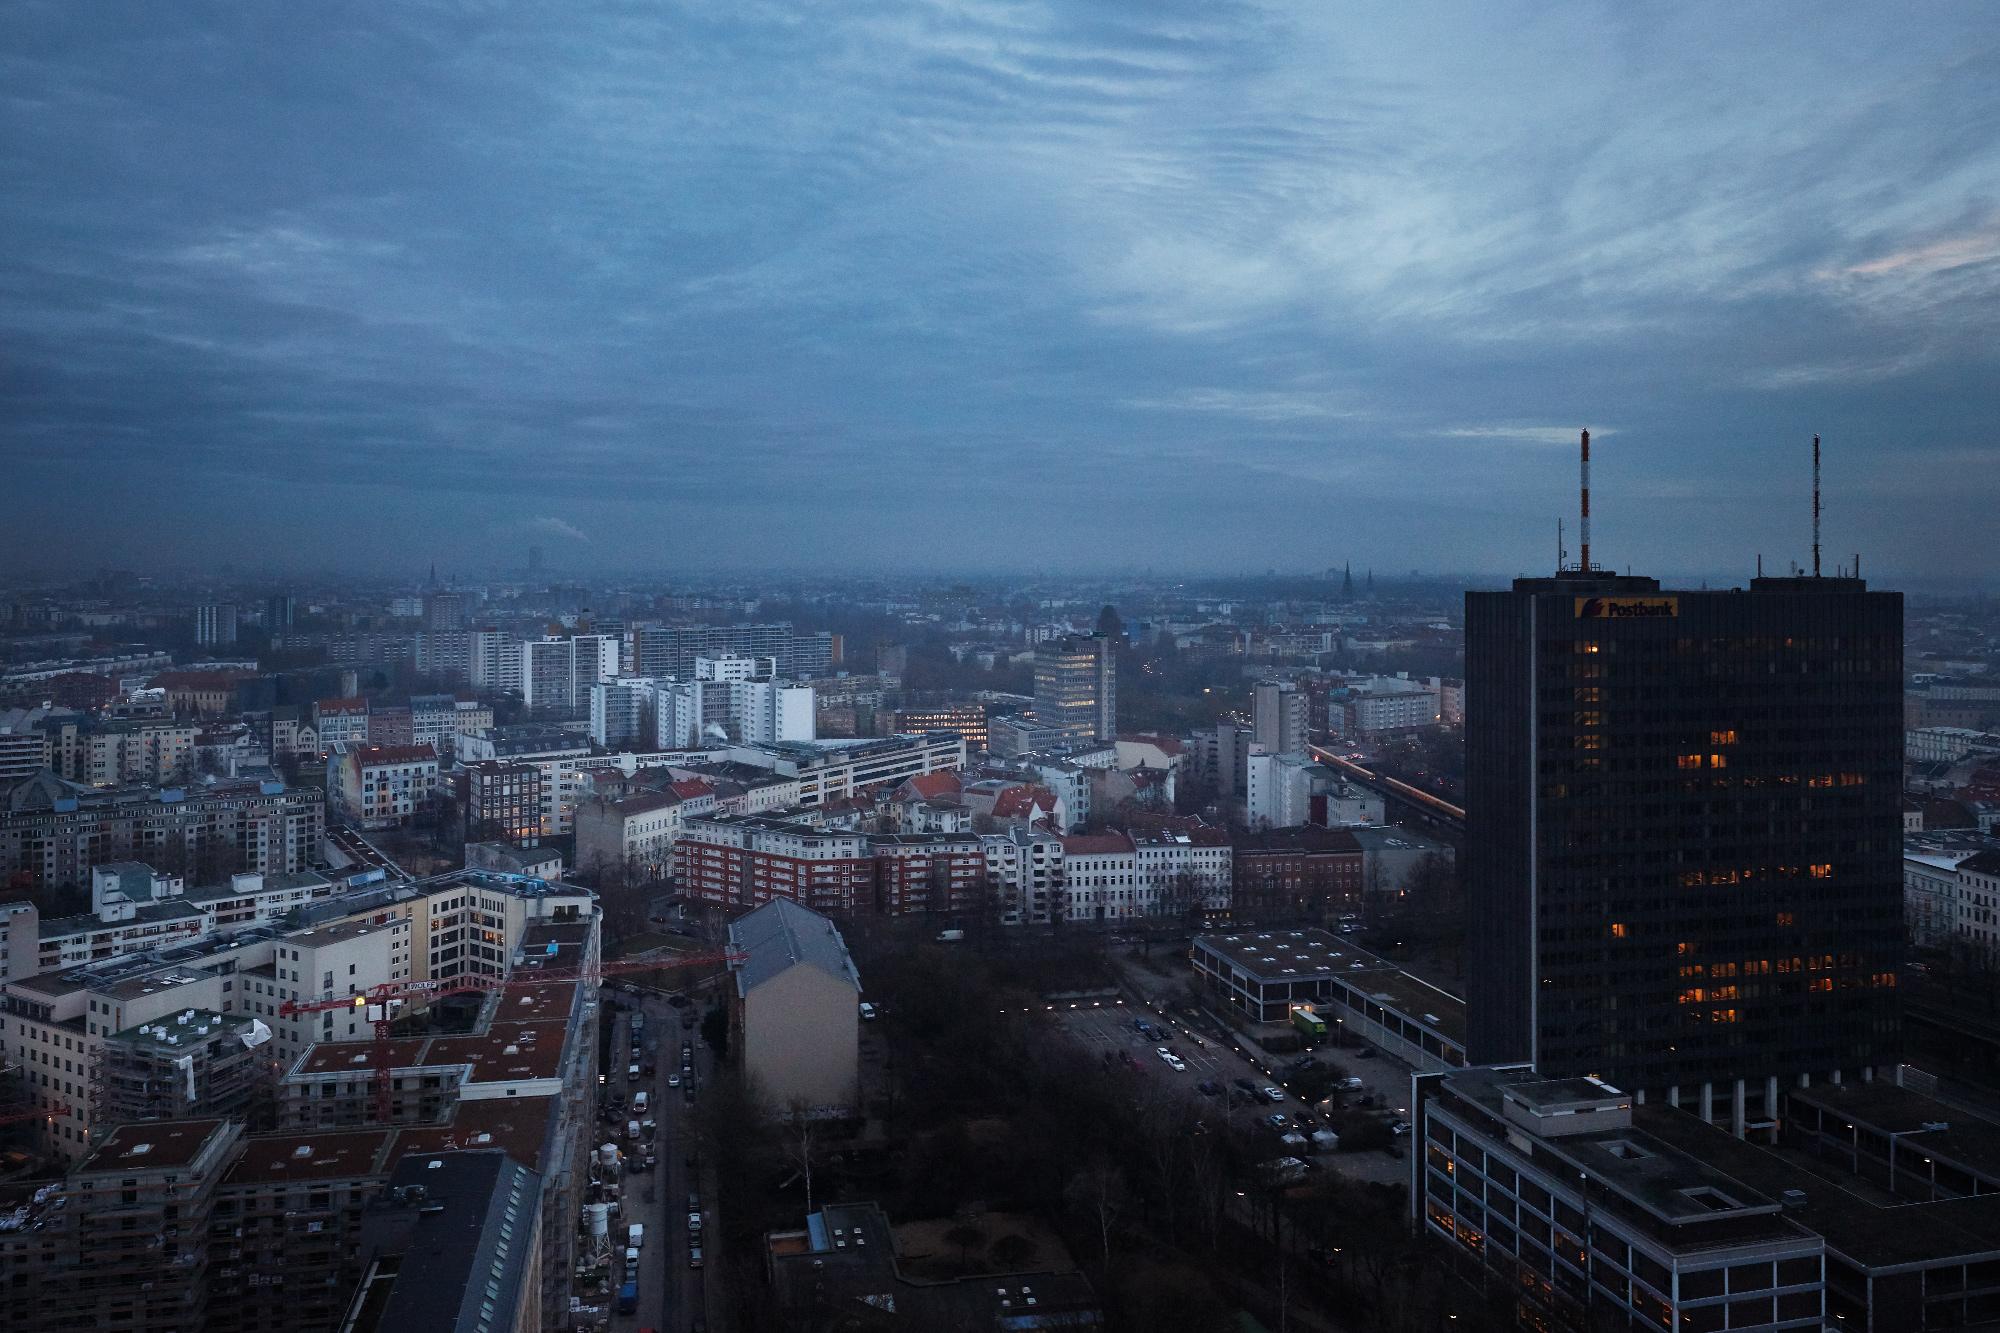 Tempodrom, Berlin, Aerial Photography, kopterwork, fotos